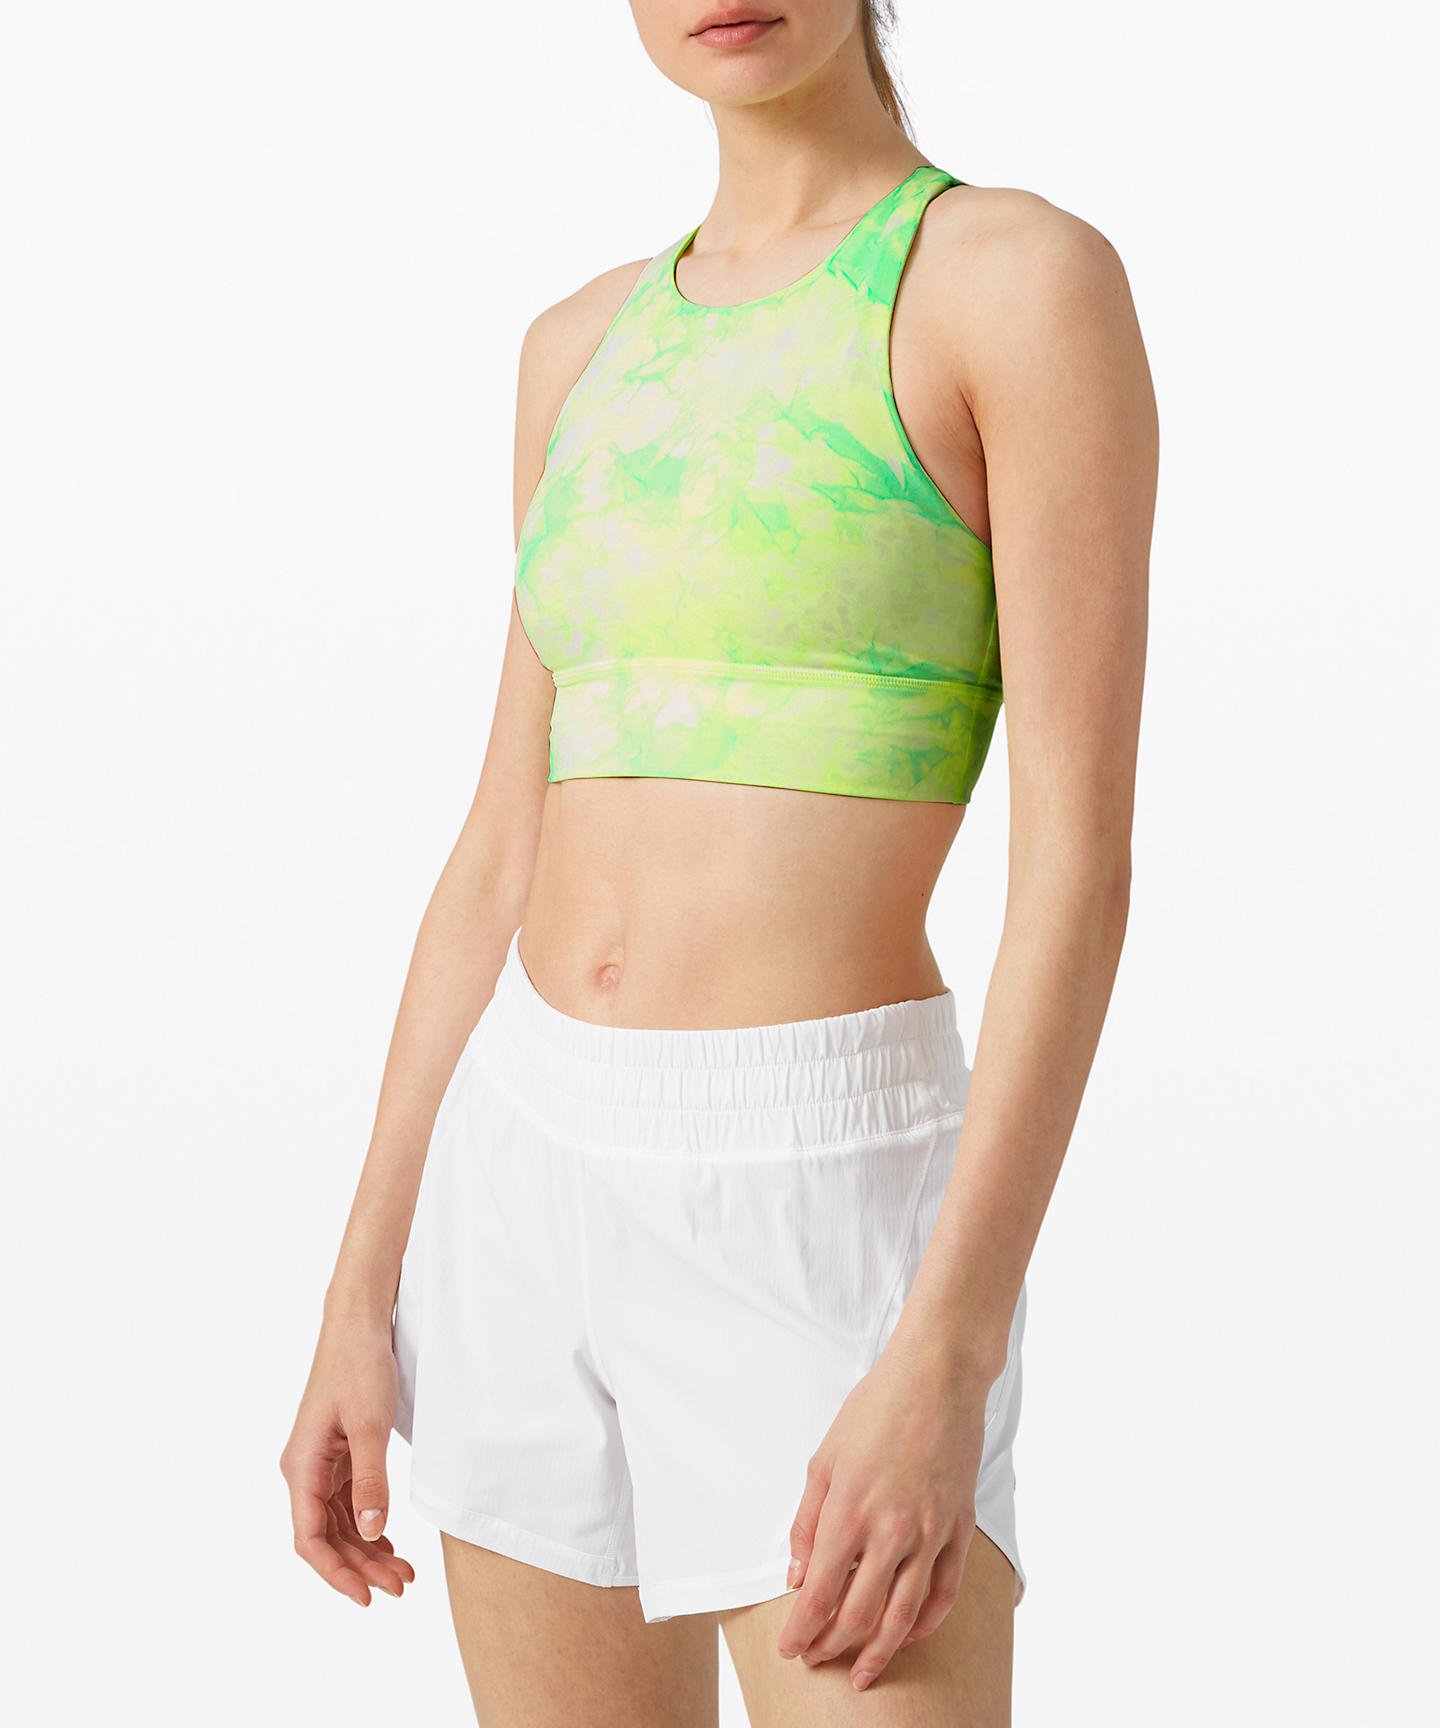 energy bra high neck long line shibori tie-dye neon_lululemon